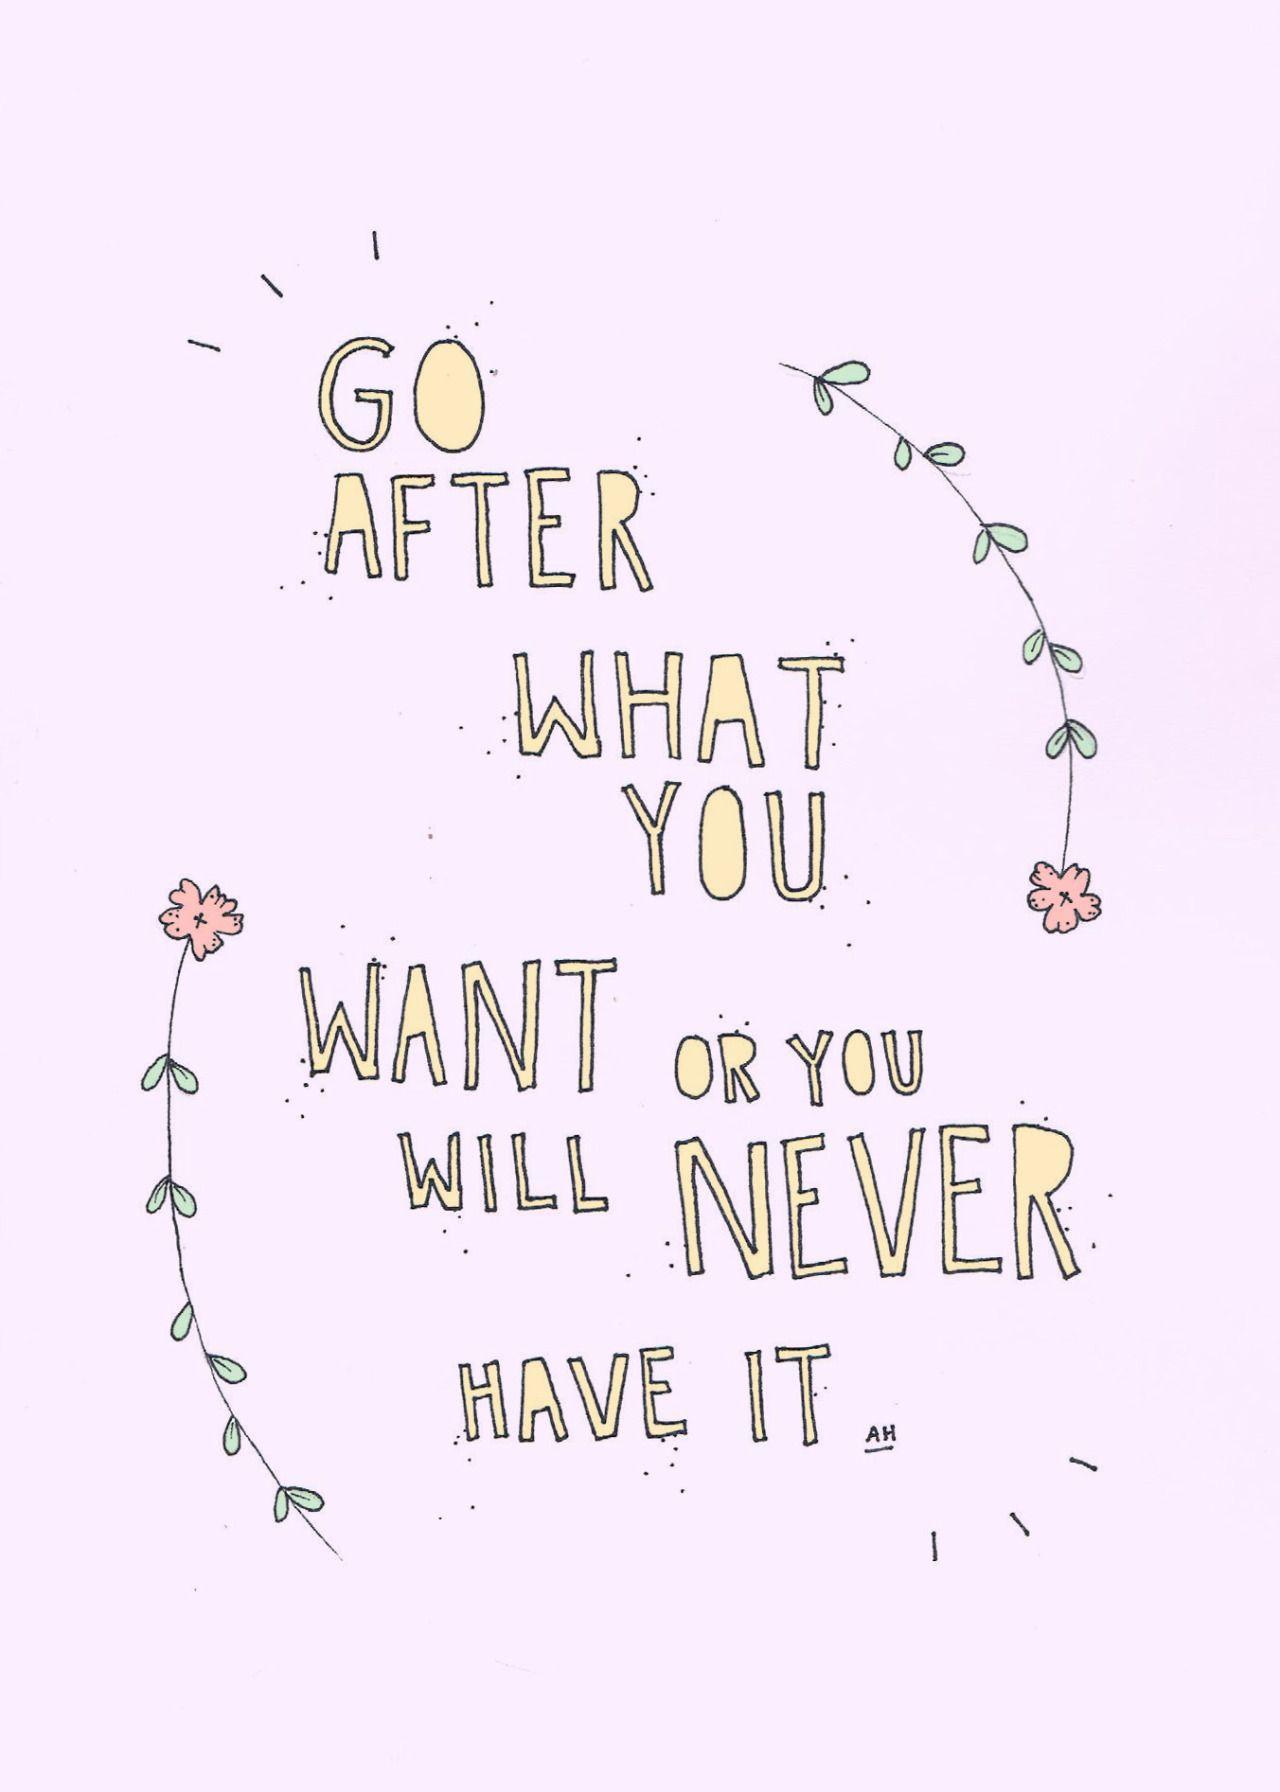 Bittersweet Photo Motivational Quotes TumblrPositive